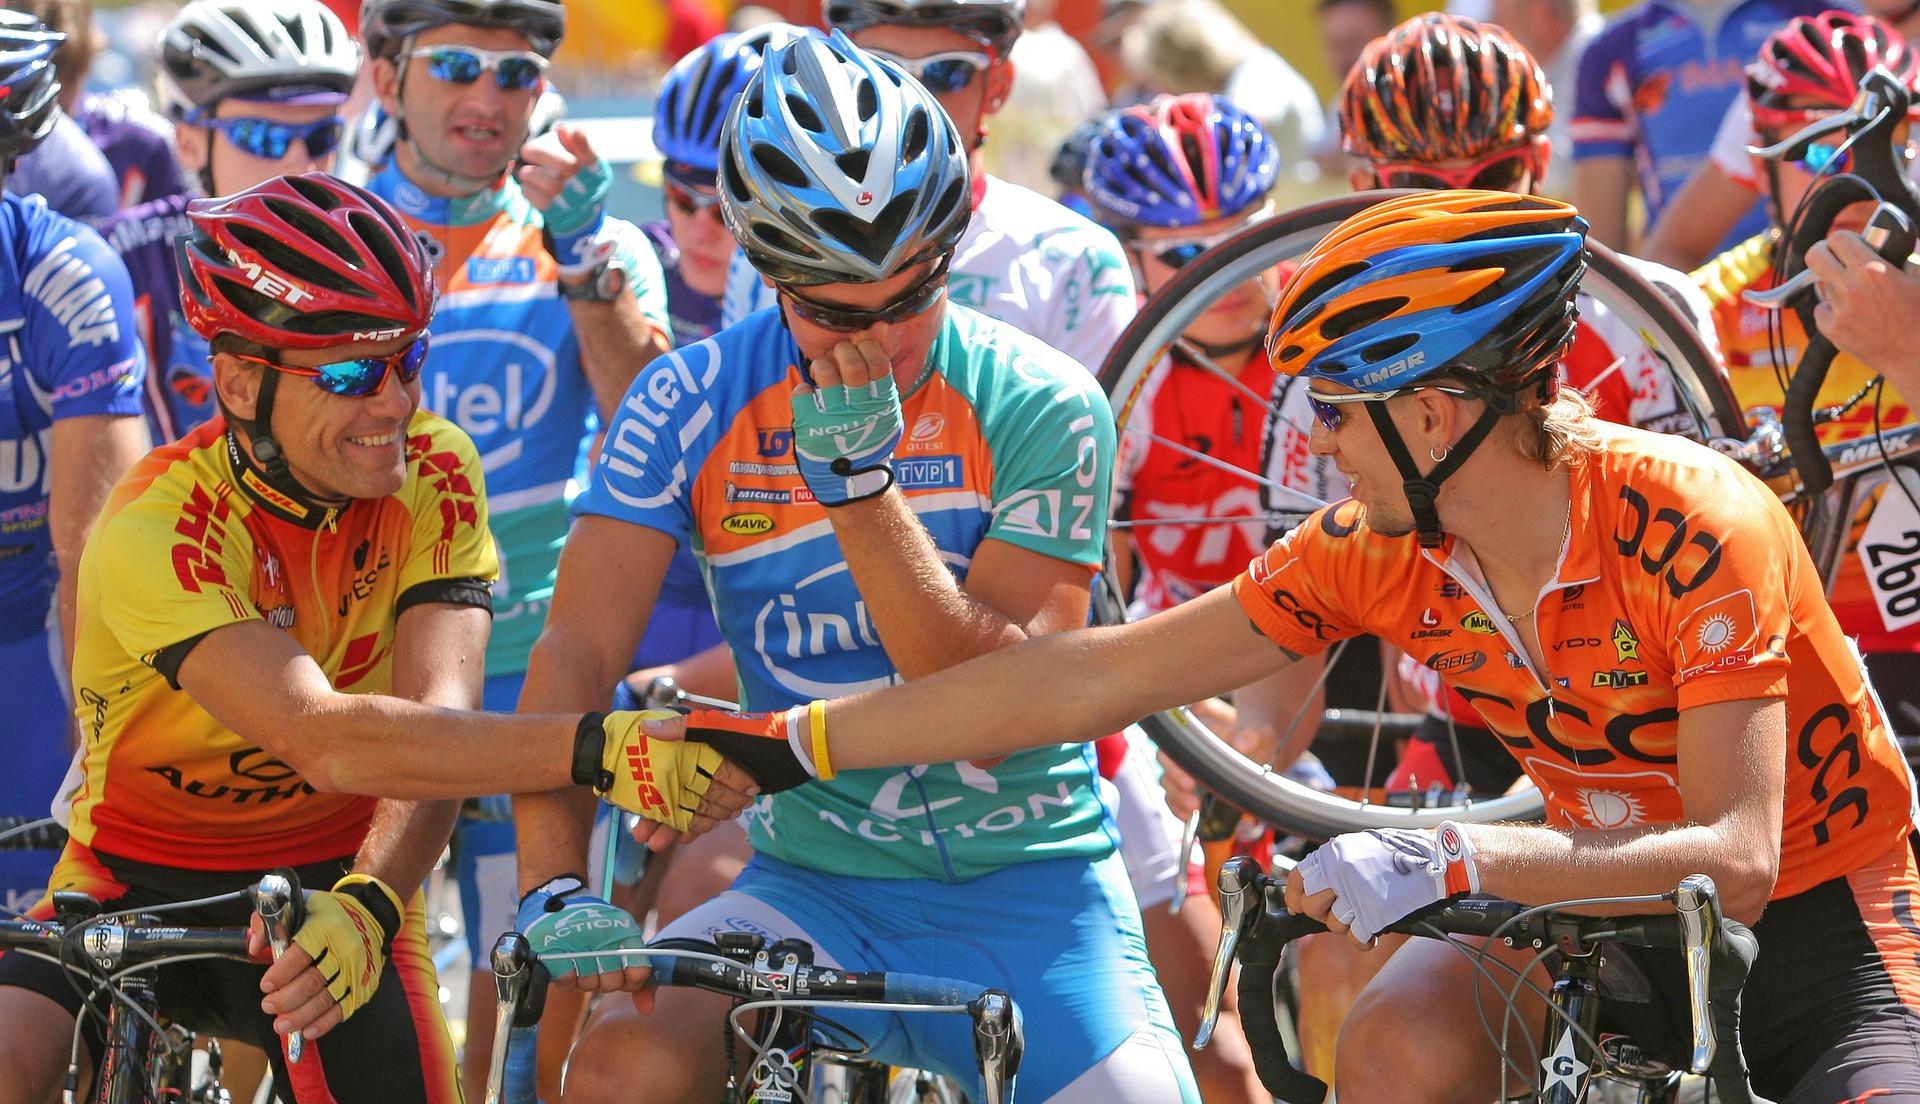 Cyclistes se serrant la main